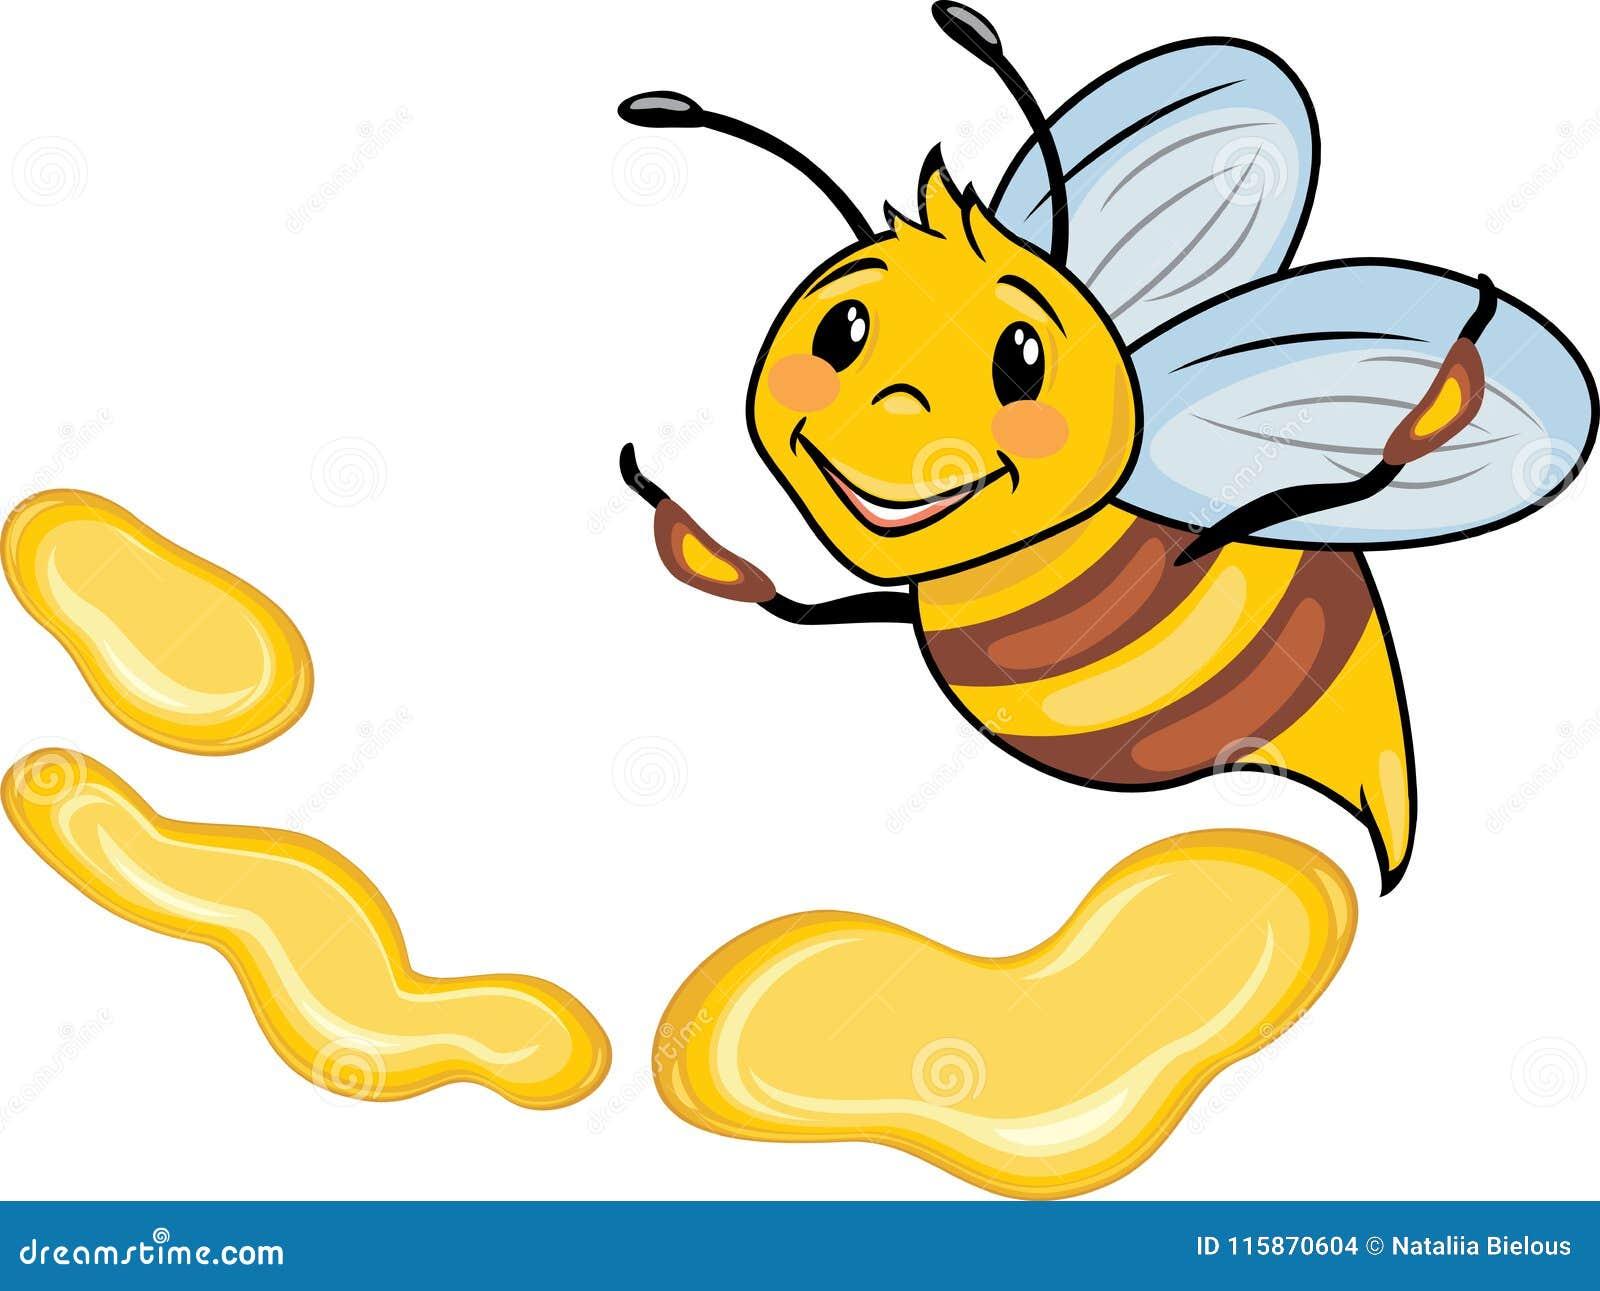 Happy Cartoon Bee And Honey Drops Stock Vector Illustration of